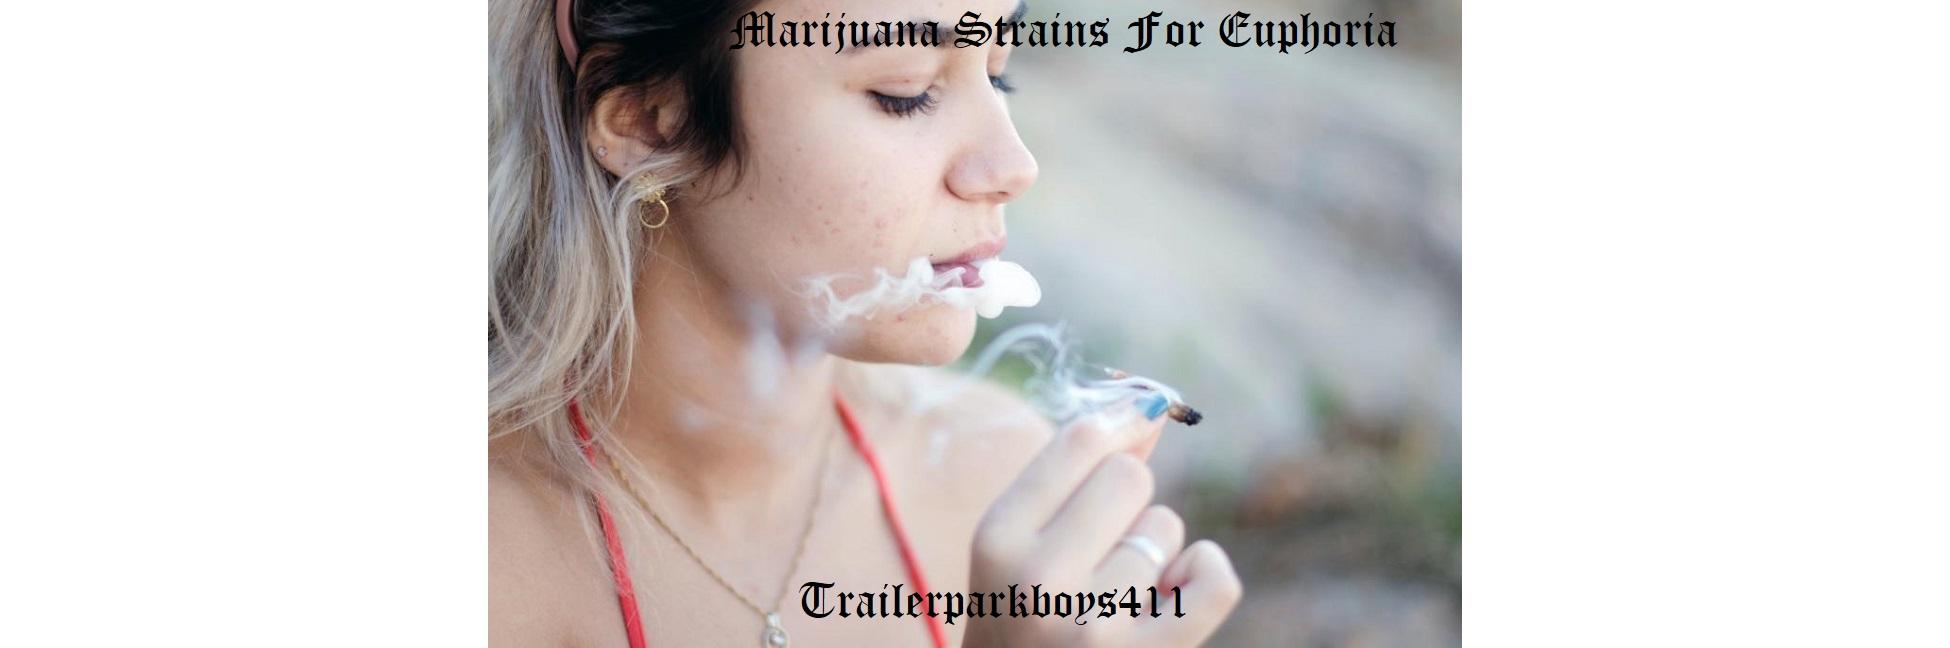 Marijuana Strains For Euphoria